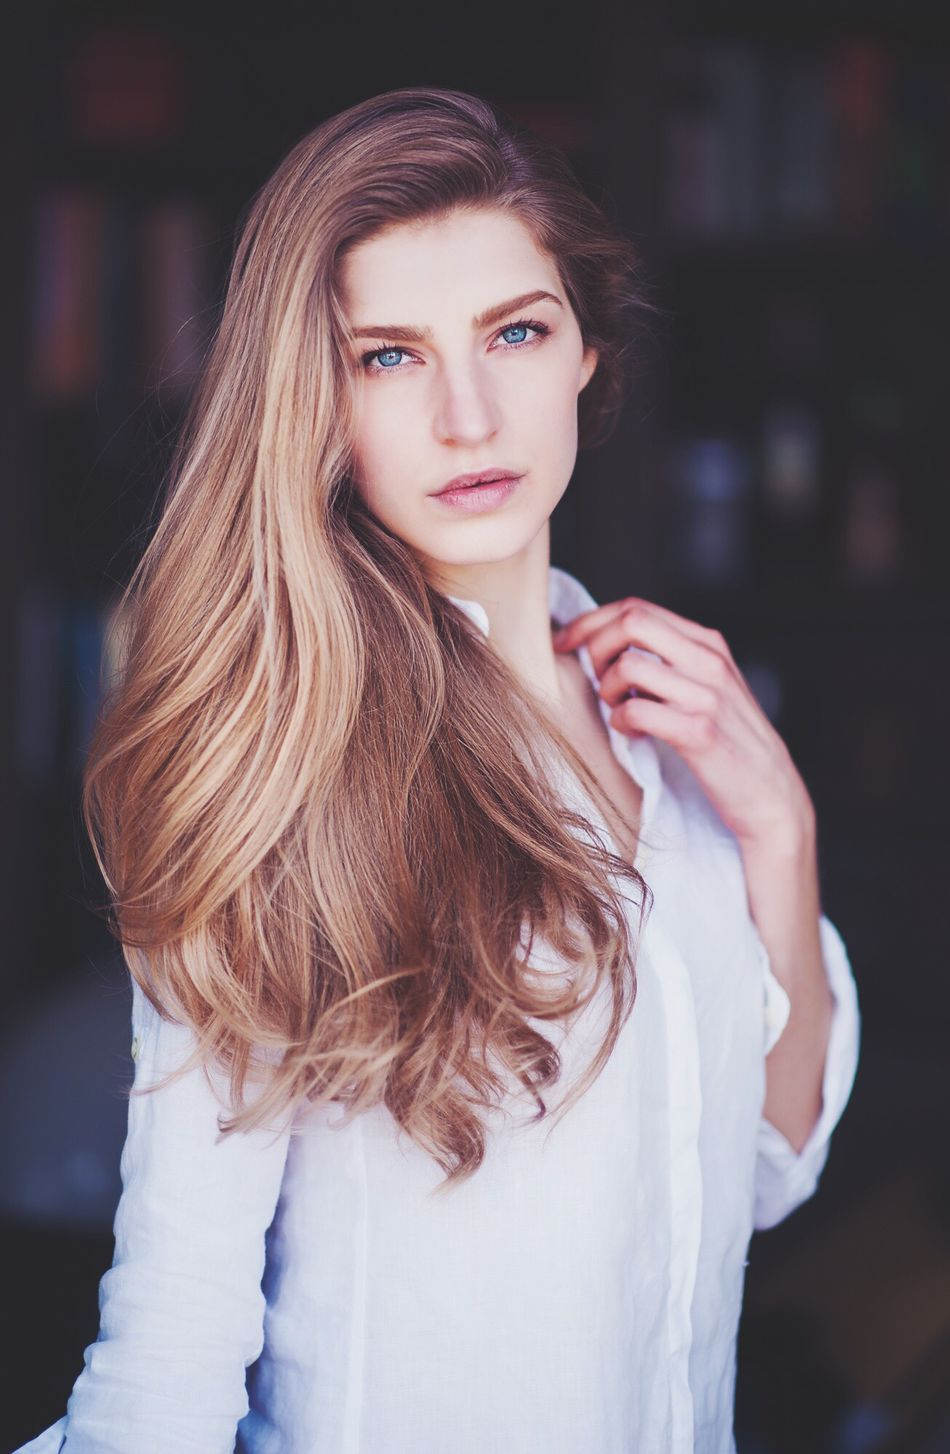 Beautiful stock photos of augen, beauty, long hair, fashion, beautiful people